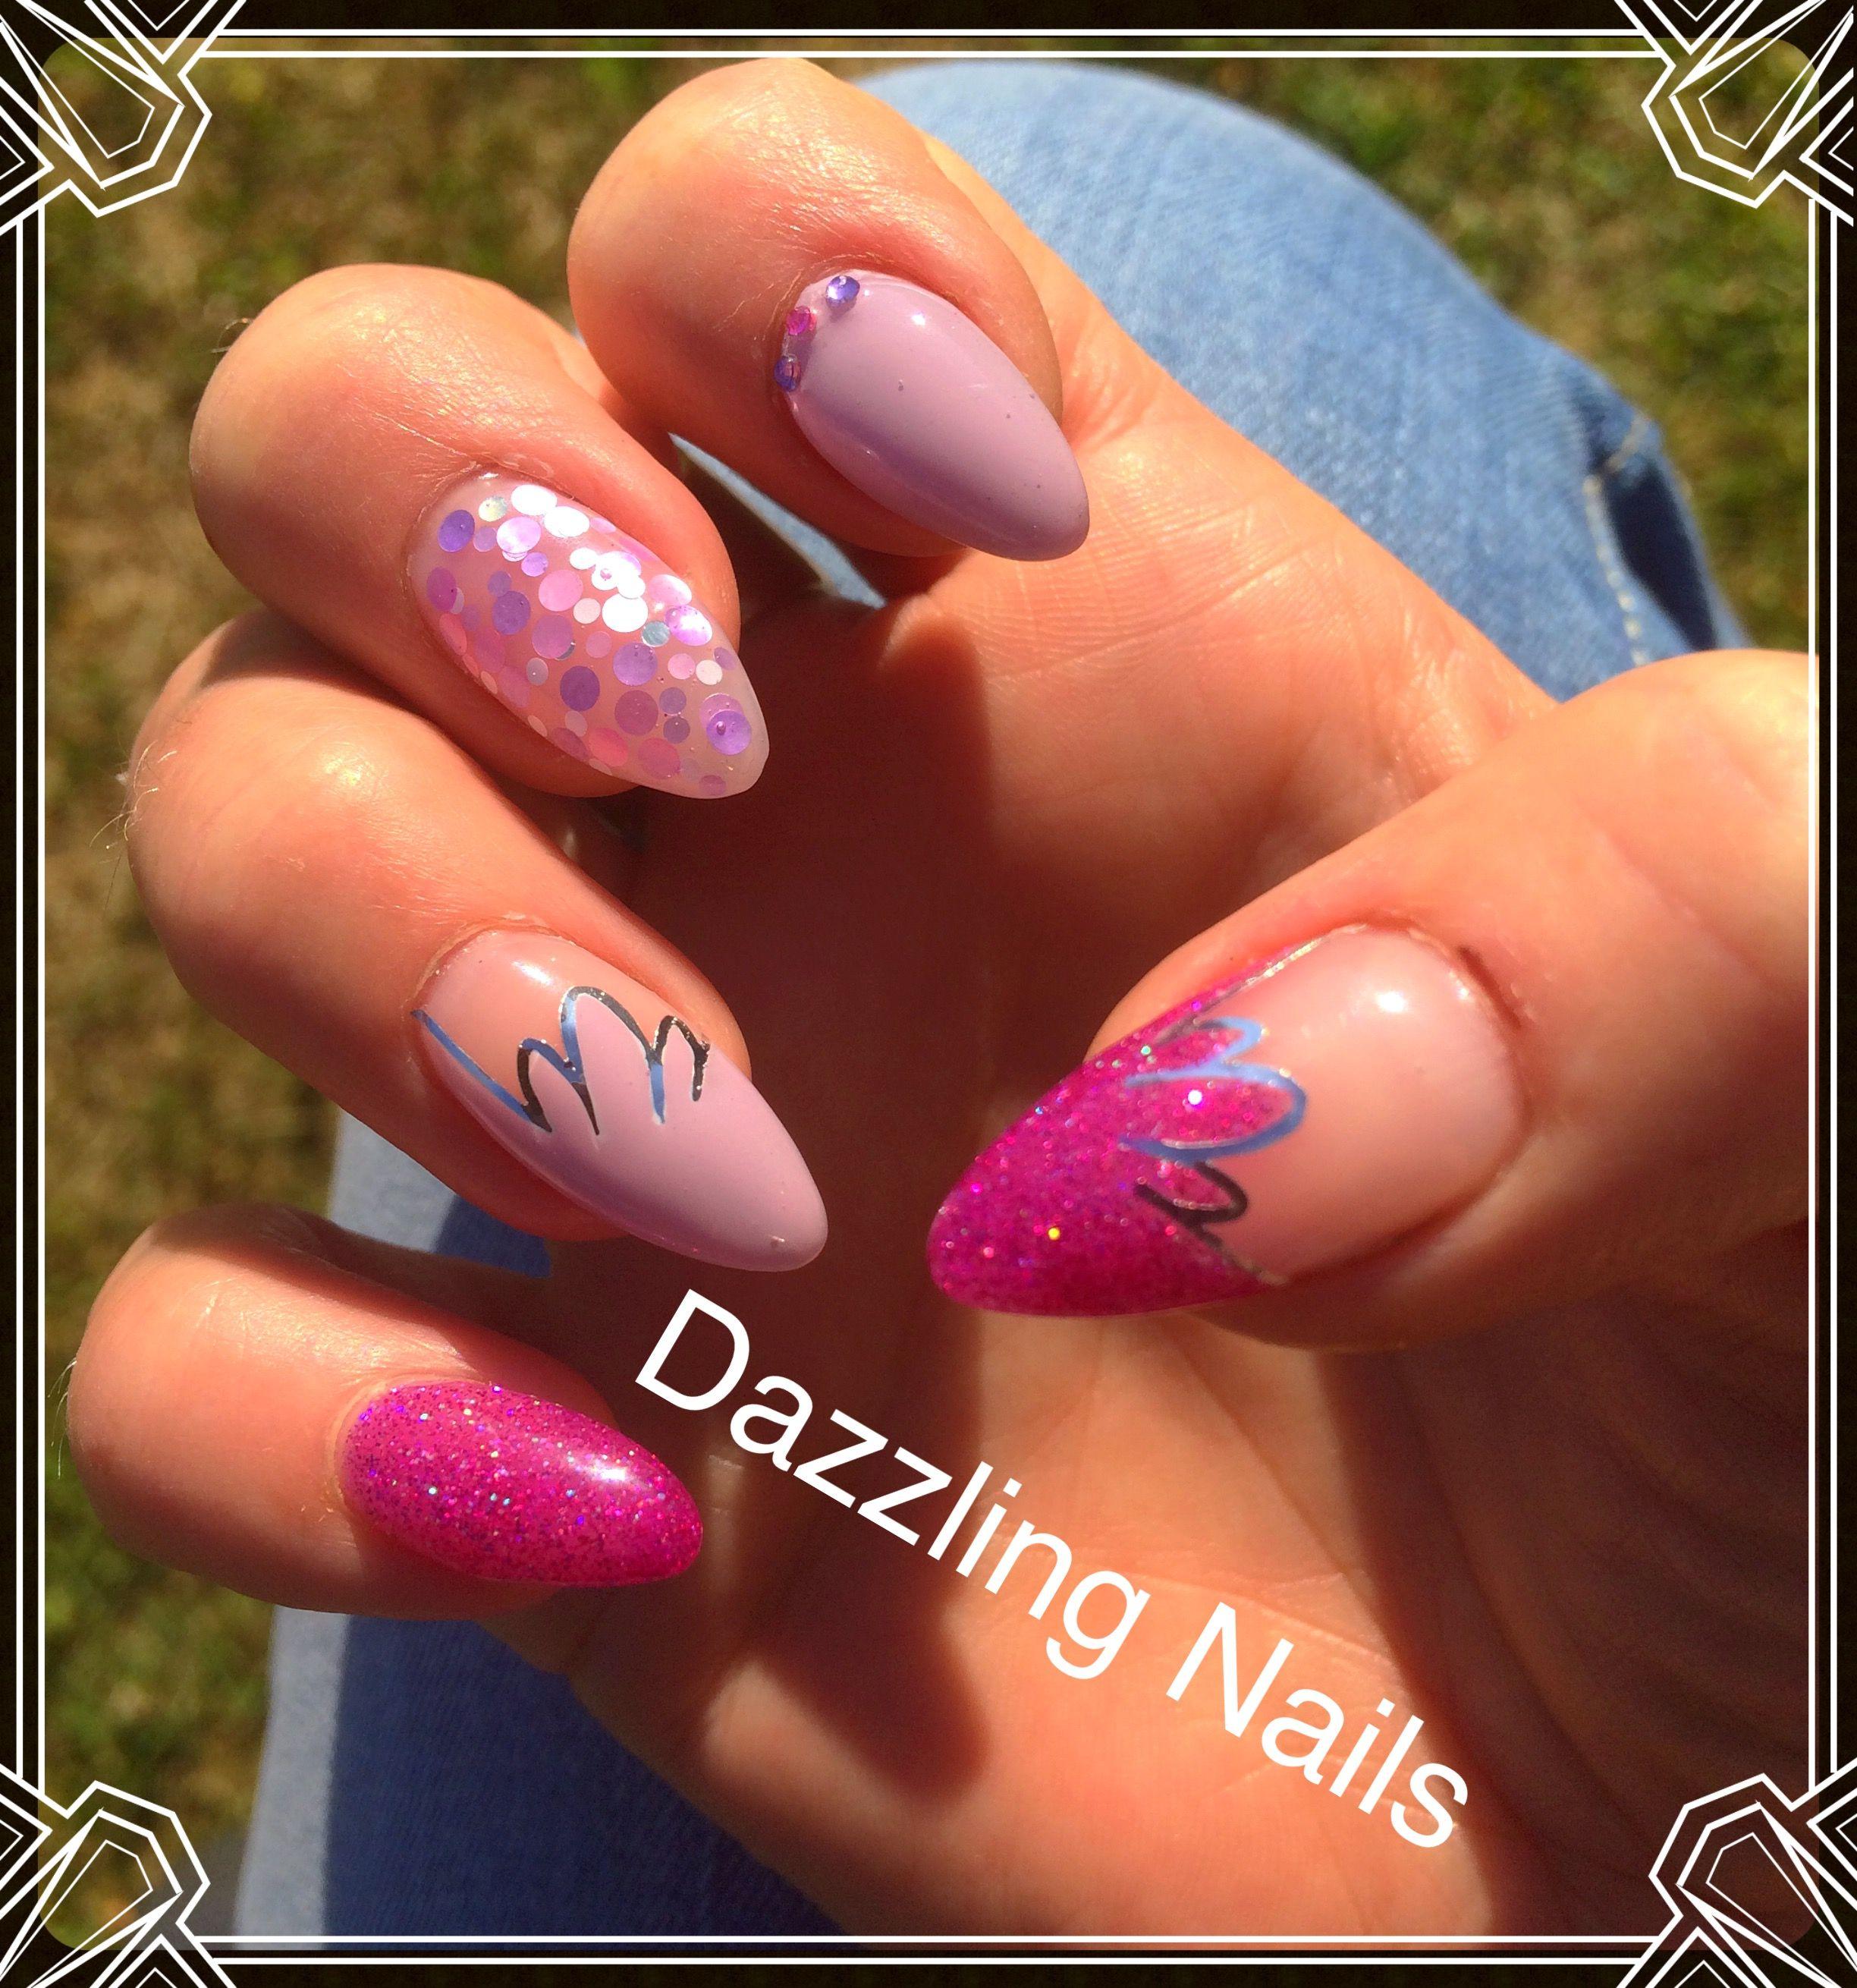 Pin by Daisy Depelseneer on Nagelstudio Dazzling Nails | Pinterest